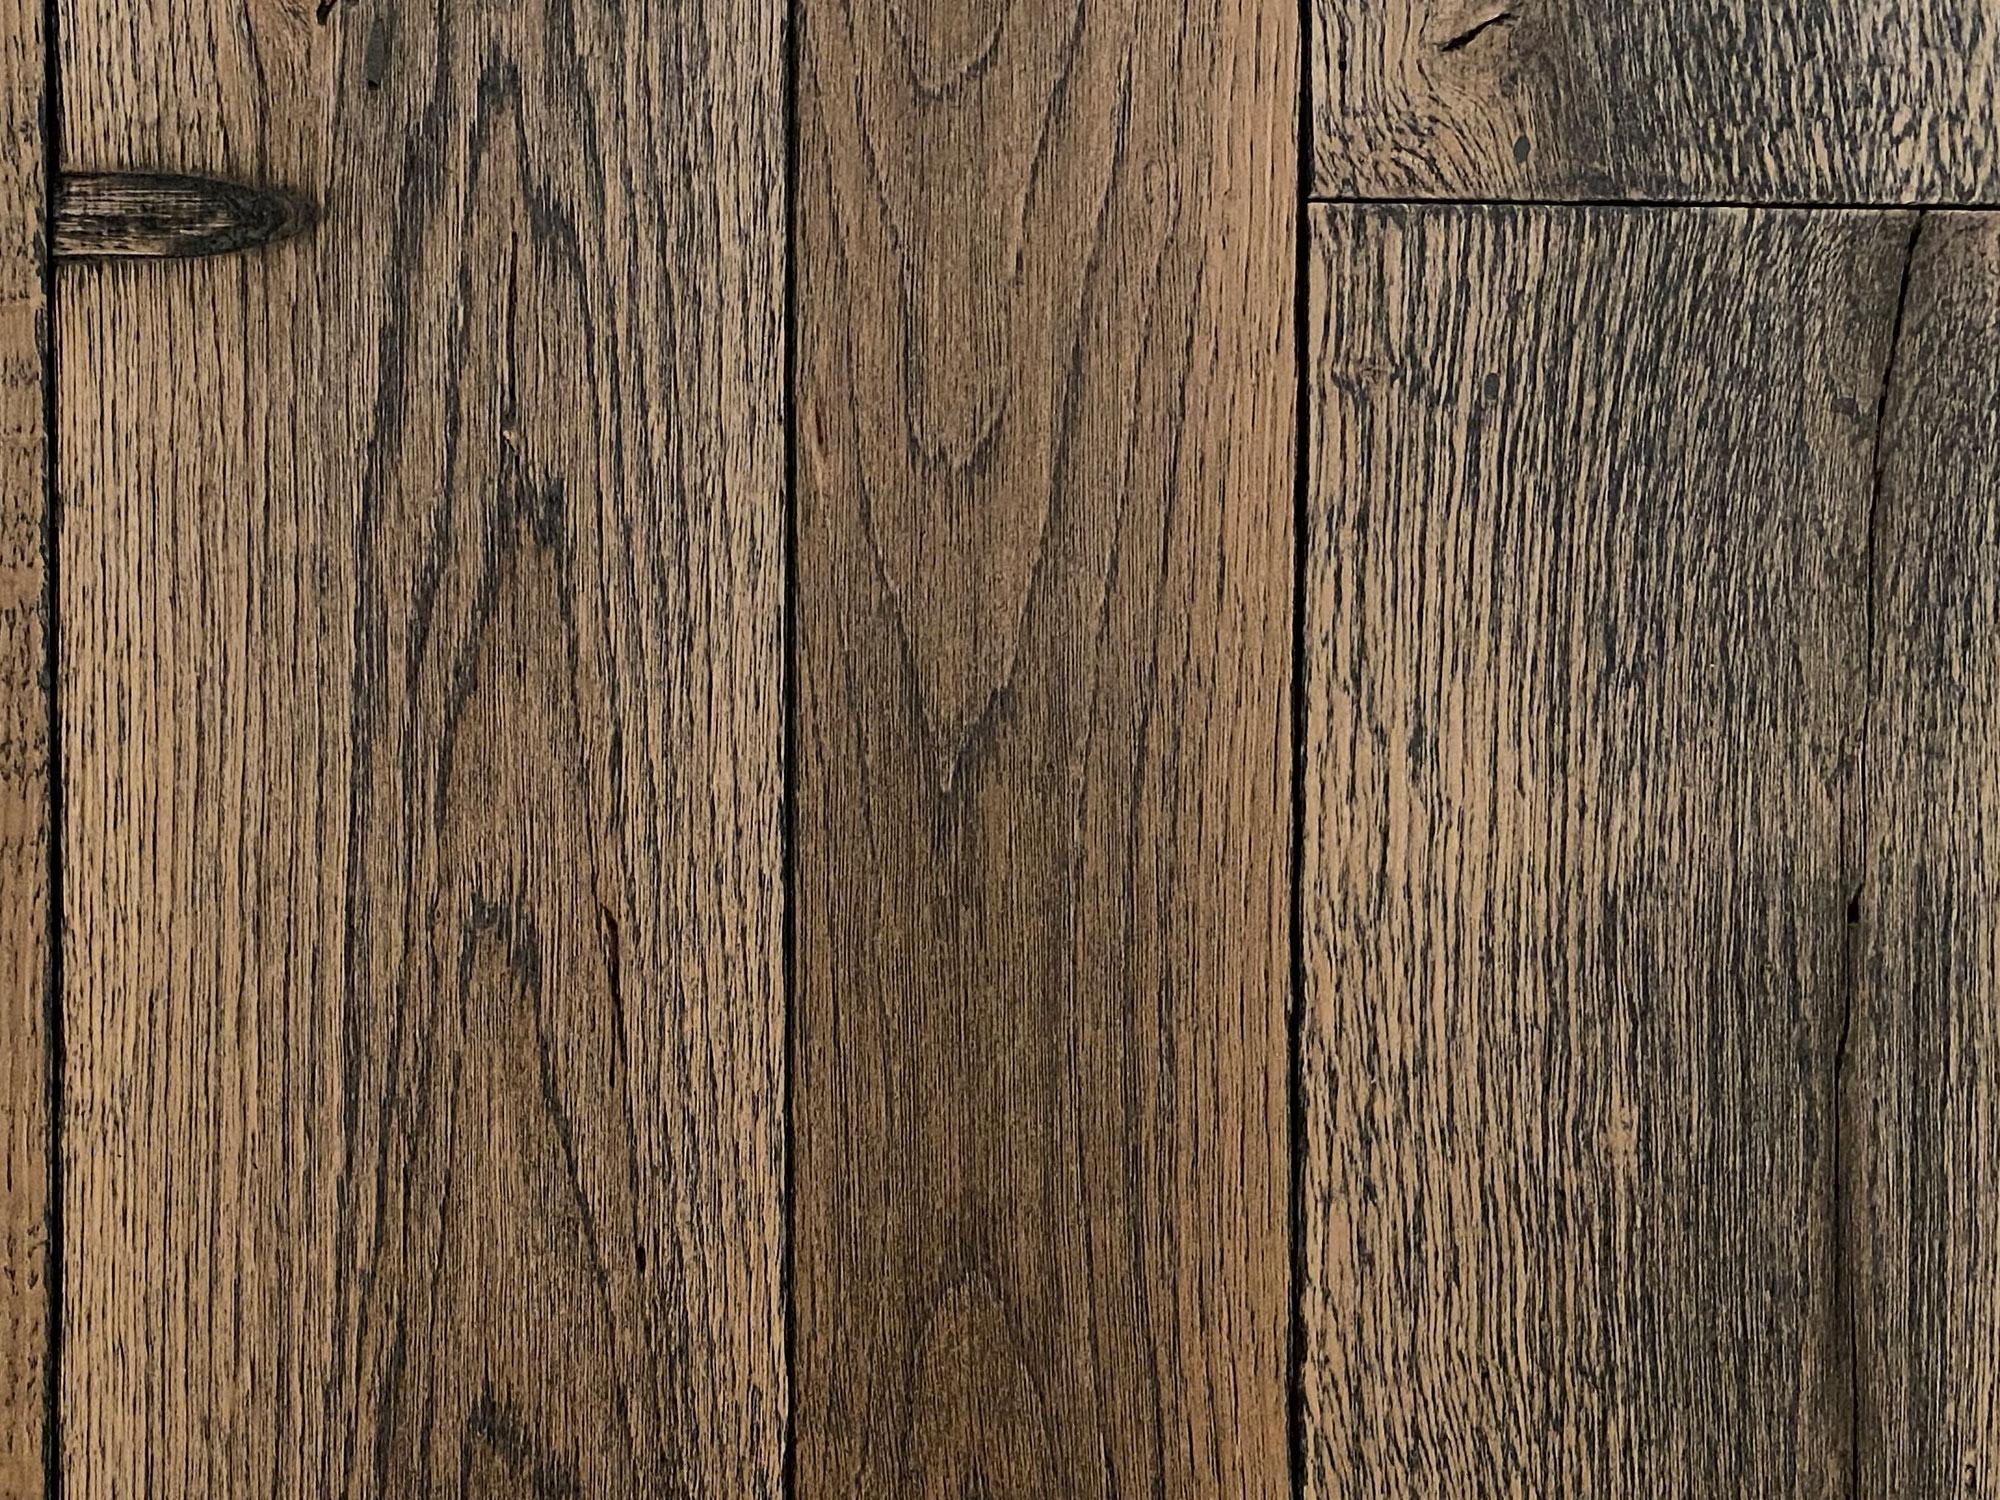 Smoked oak engineered wood flooring